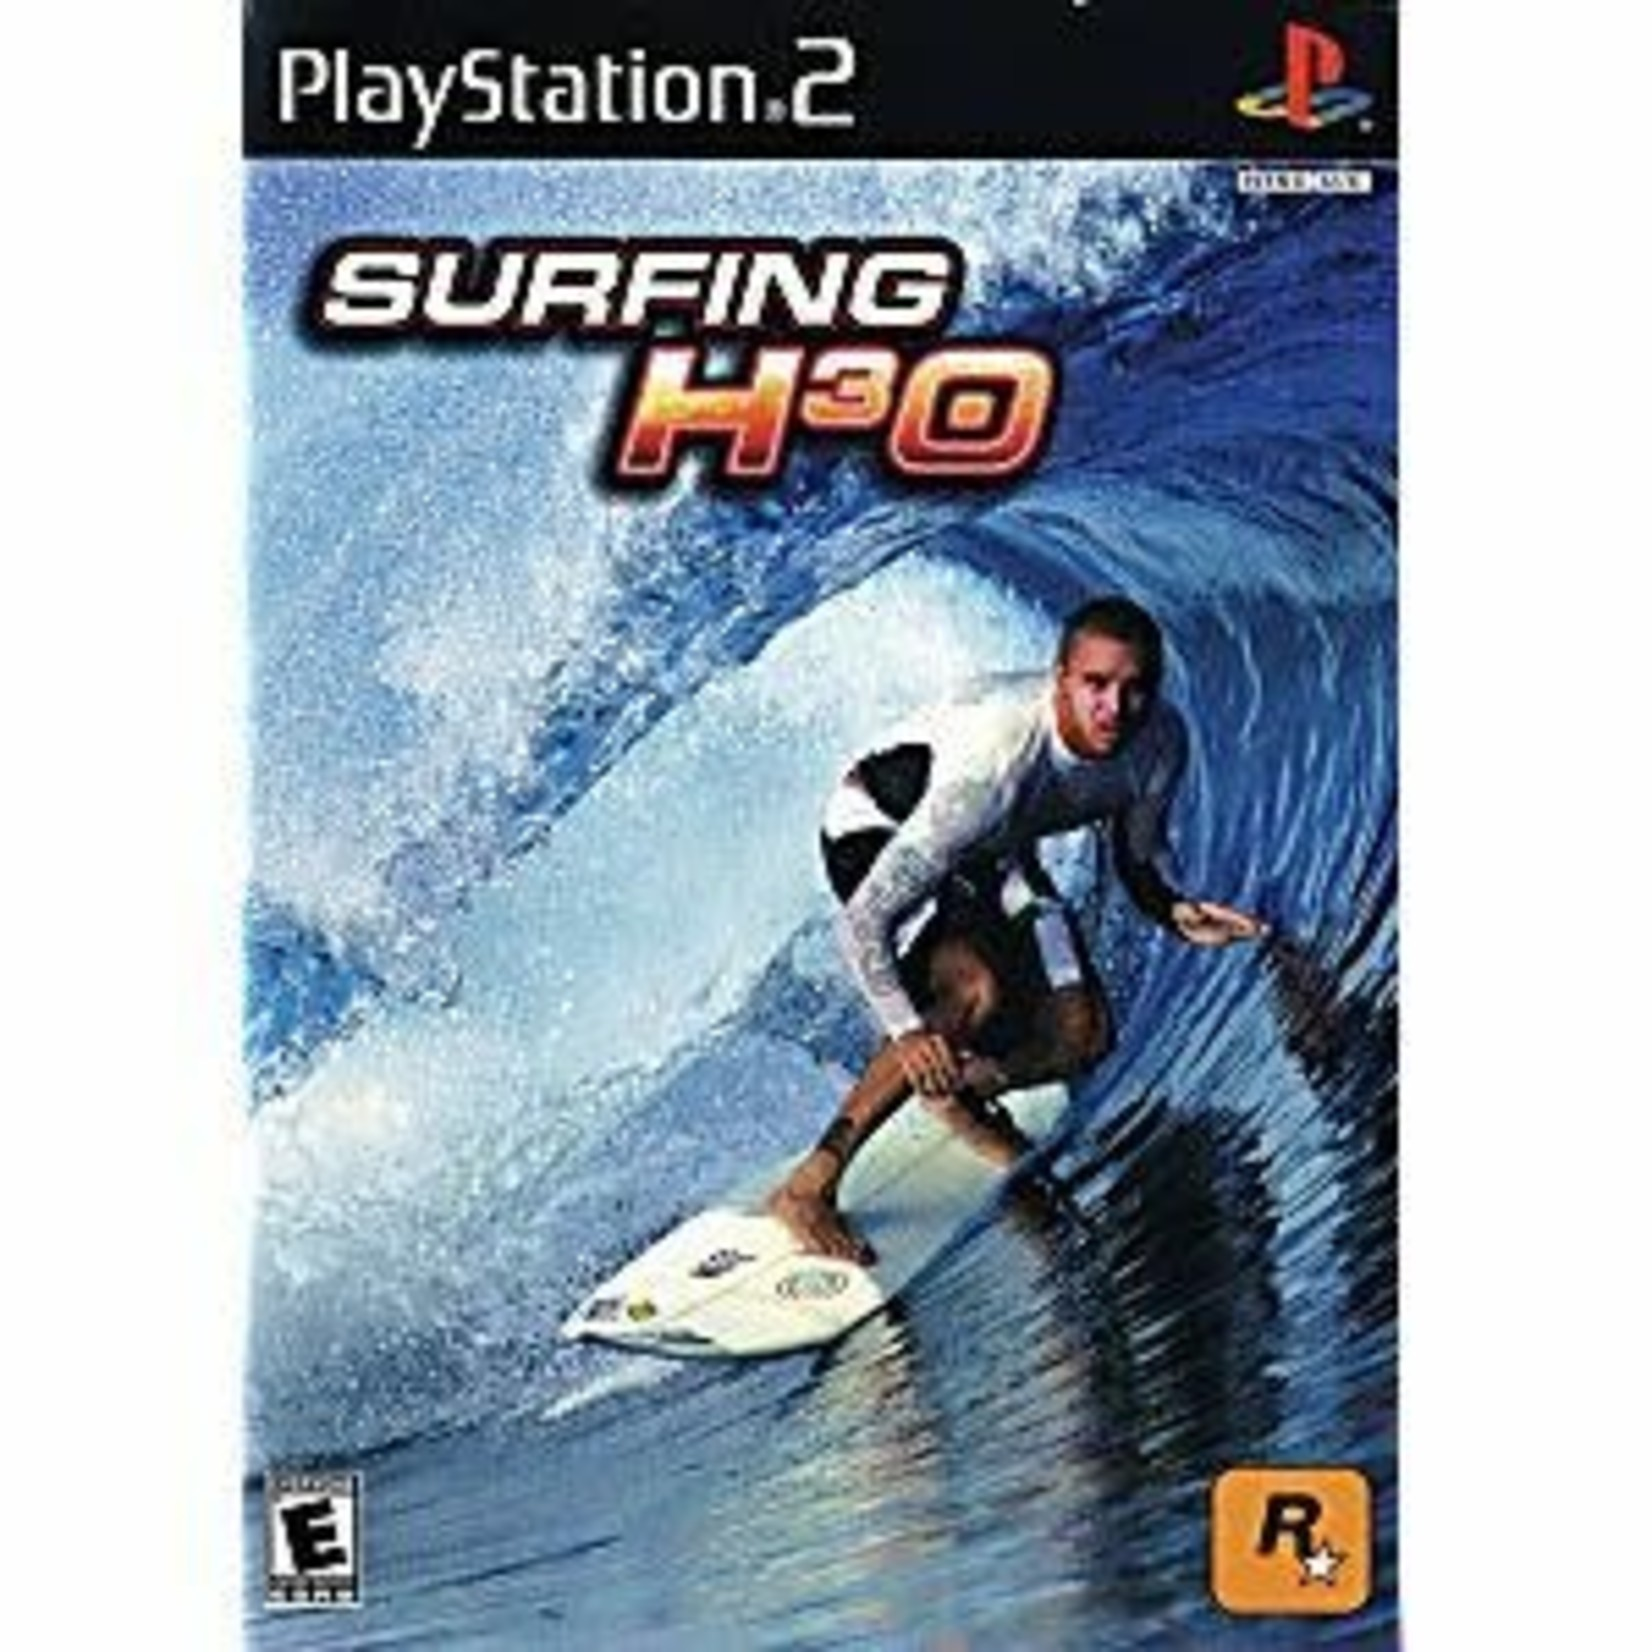 PS2U-SURFING H3O